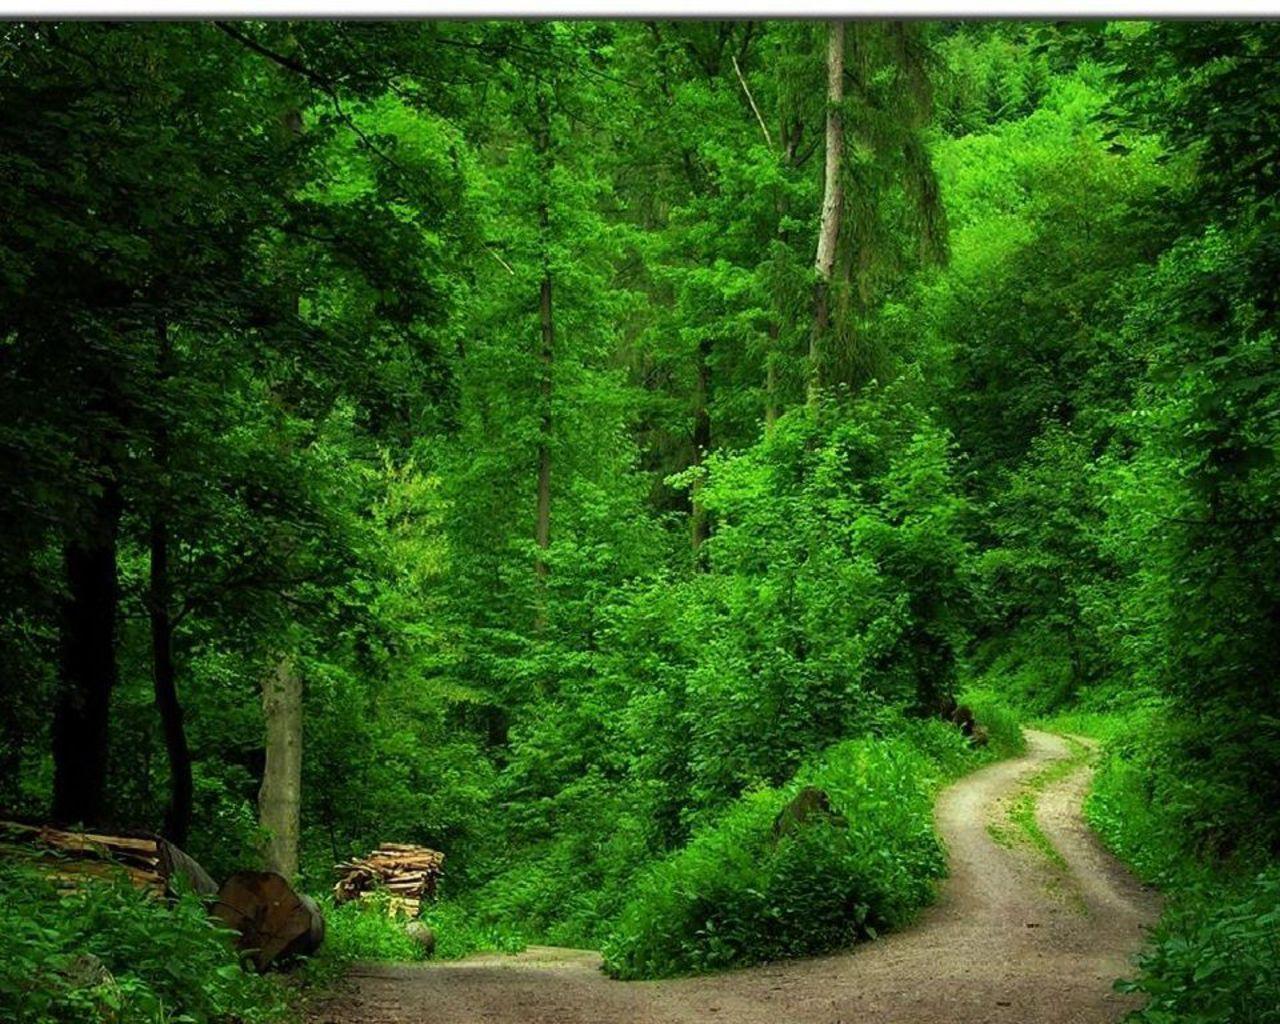 download hd wallpaper forest hd wallpaper forest hd wallpaper foresthd wallpaper forest hd wallpaper forest hd wallpaper forest hd